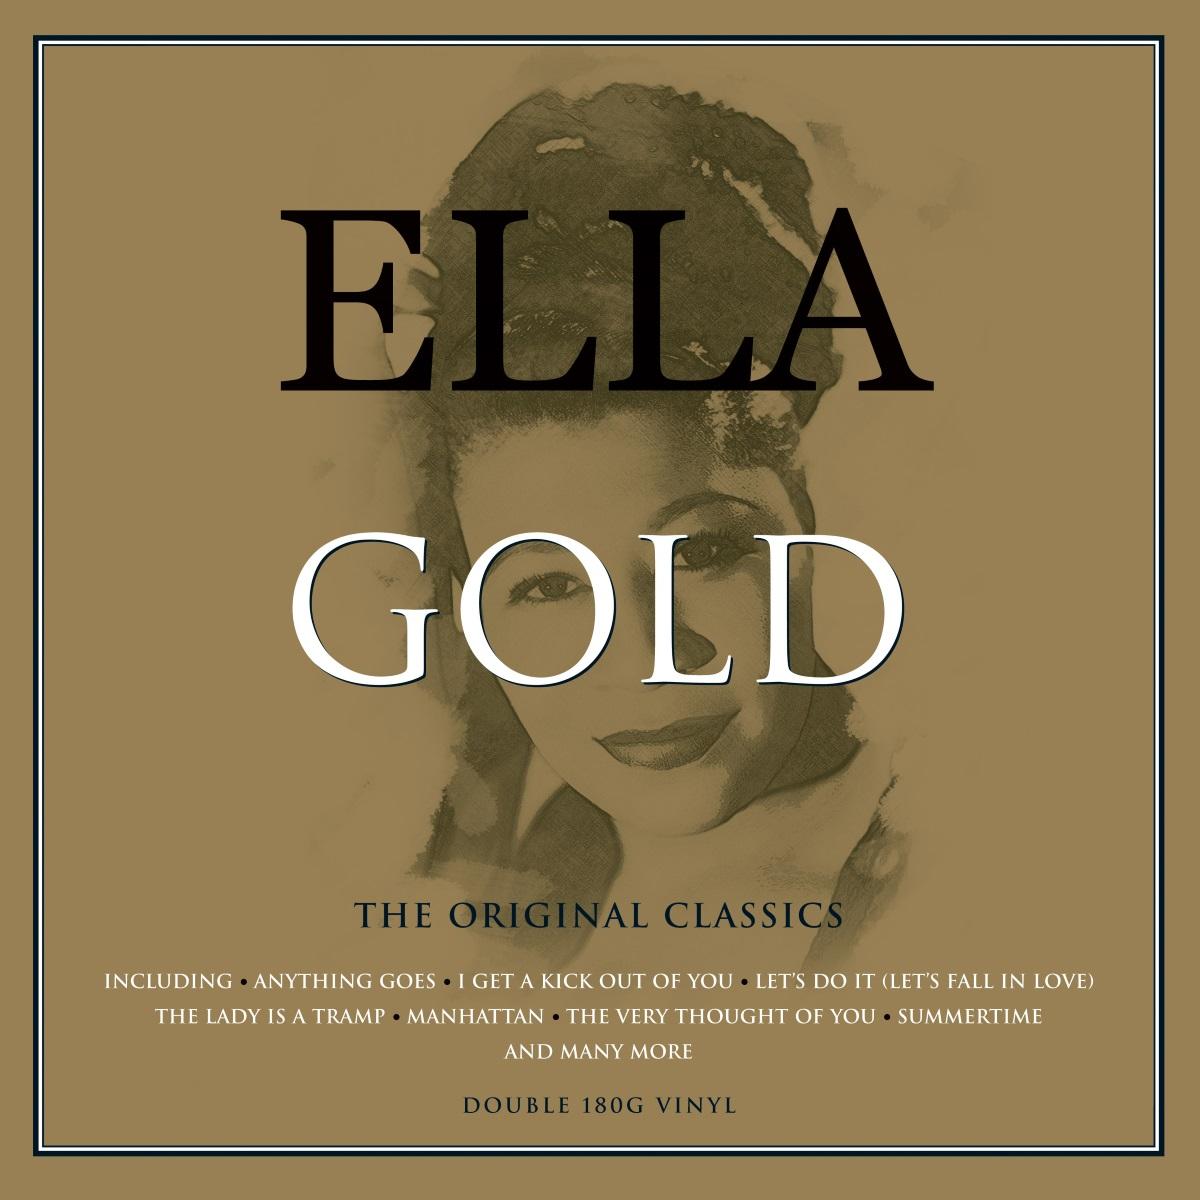 Ella Fitzgerald – Gold (2 LP) элла фитцжеральд дайна вашингтон the golden era of jazz vol 3 ella fitzgerald